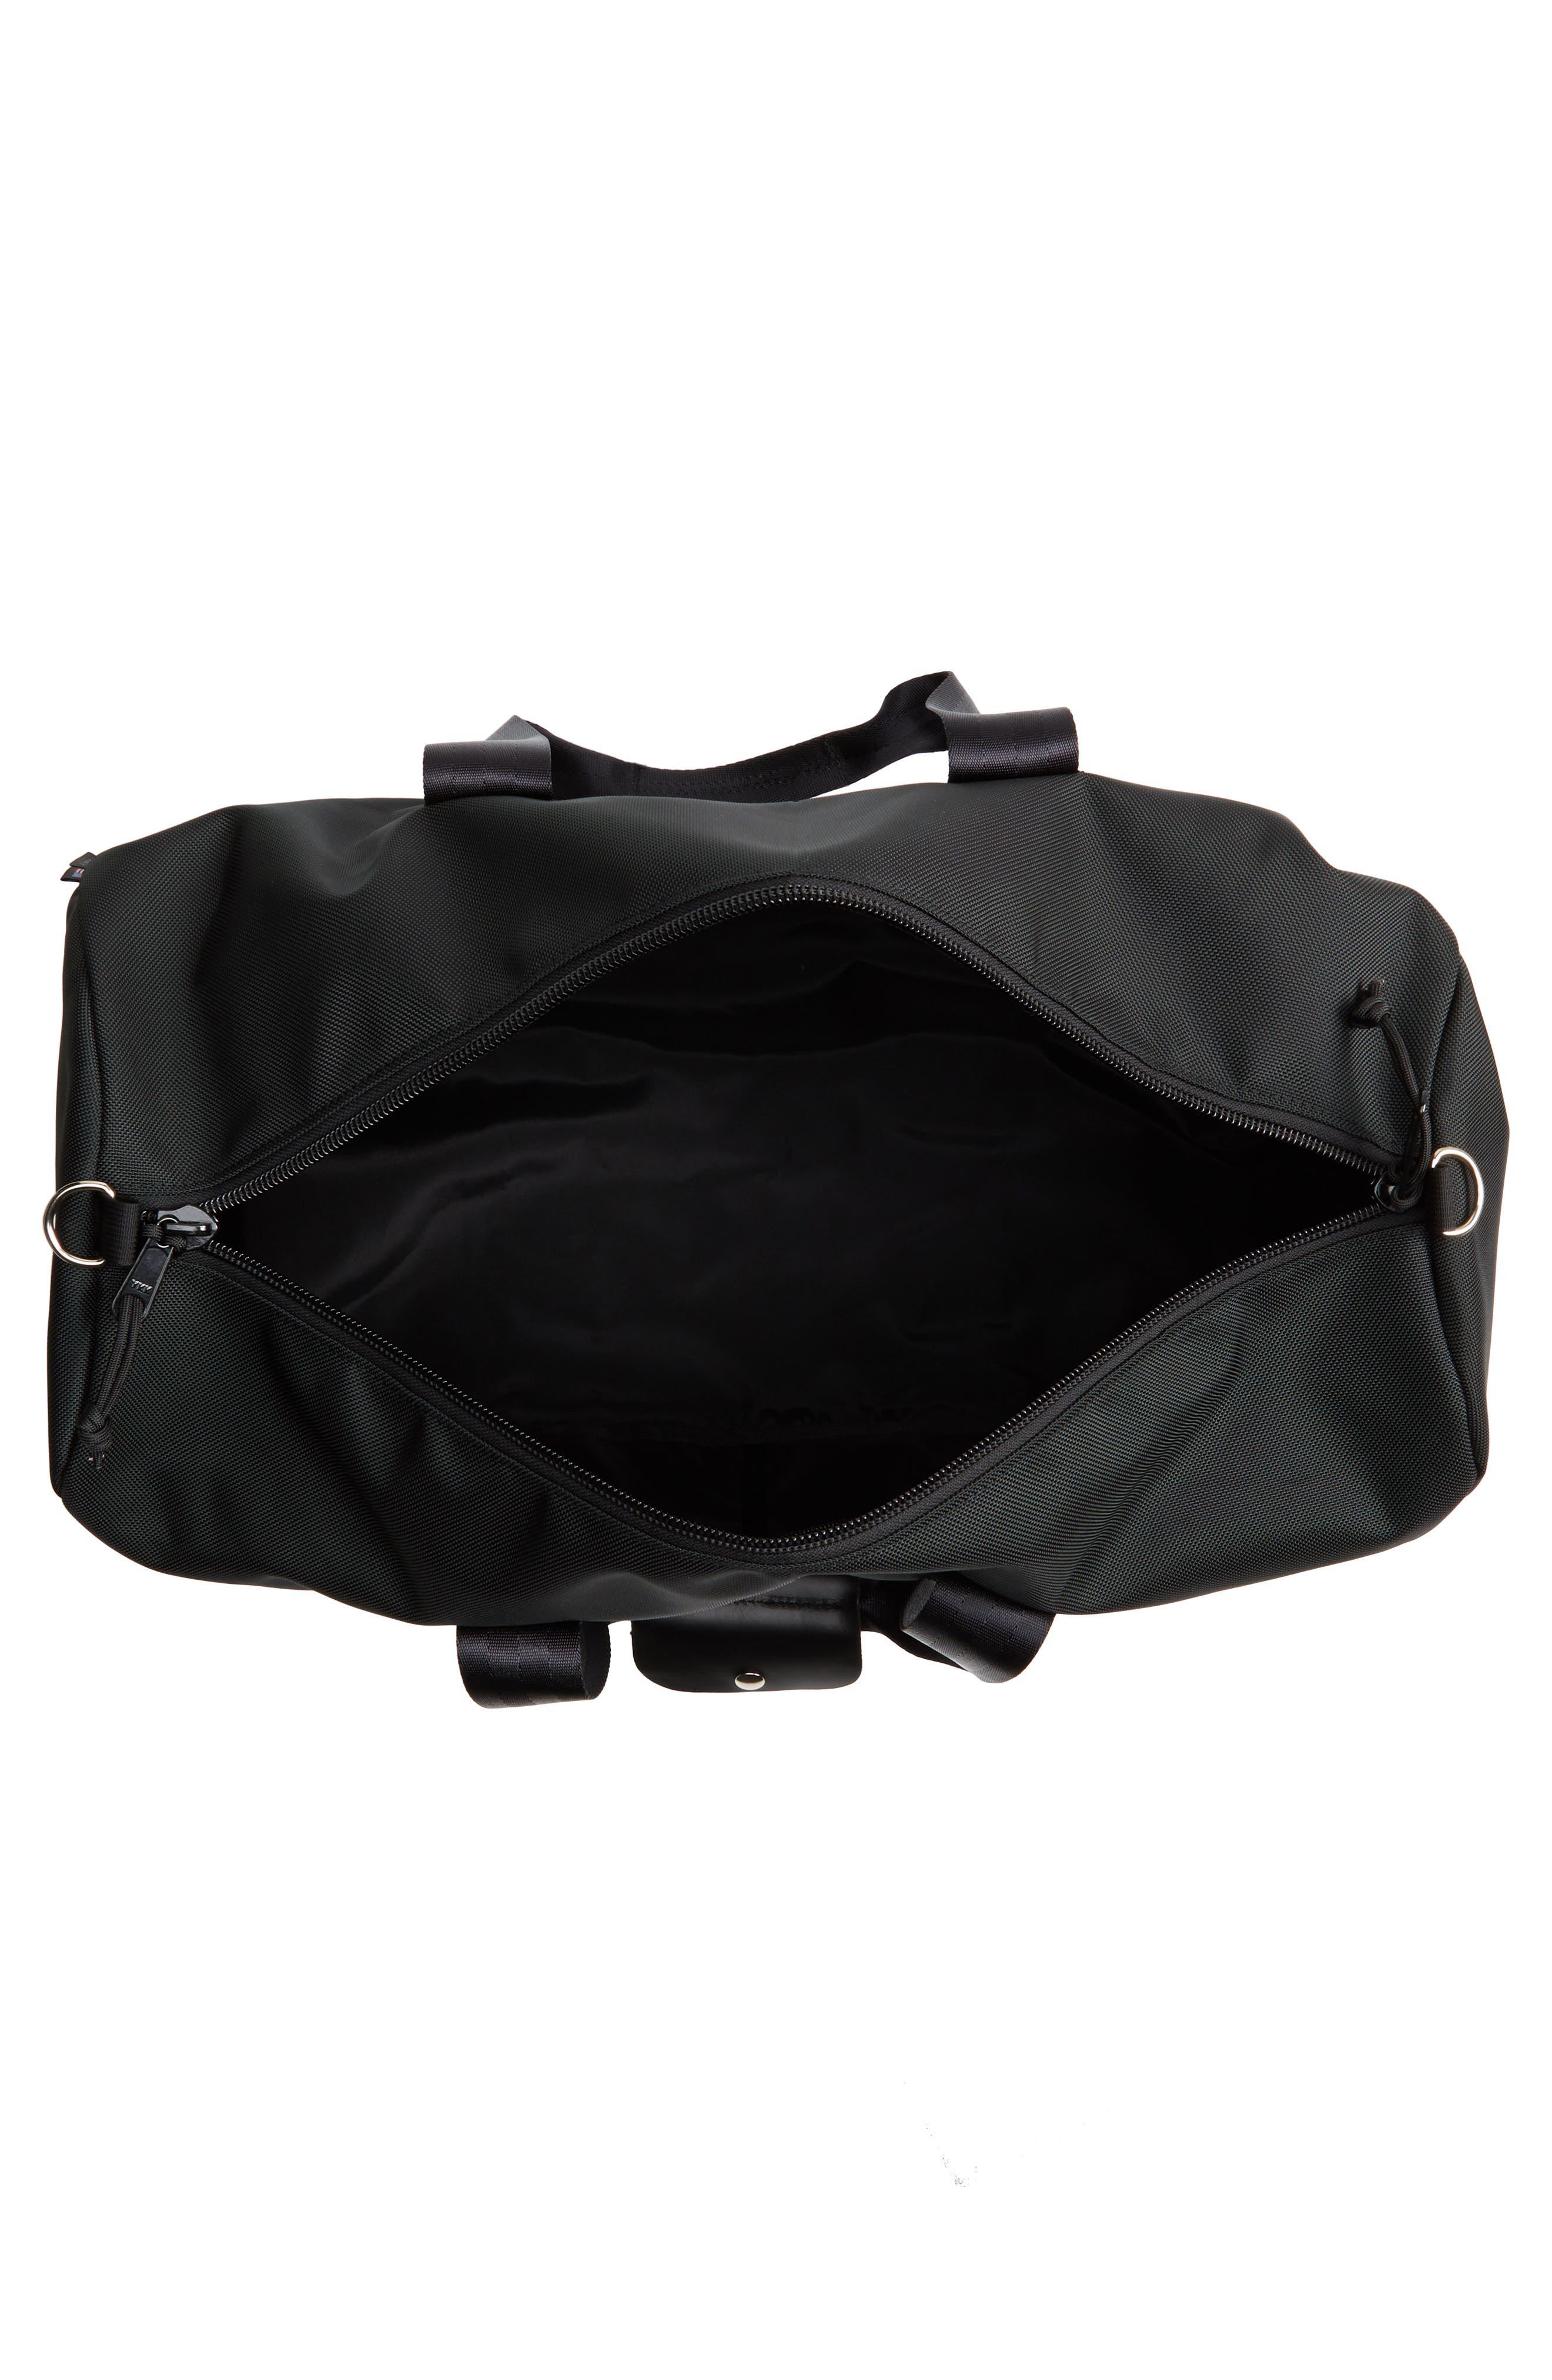 TOPO DESIGNS, Classic Duffle Bag, Alternate thumbnail 4, color, BALLISTIC BLACK/ BLACK LEATHER